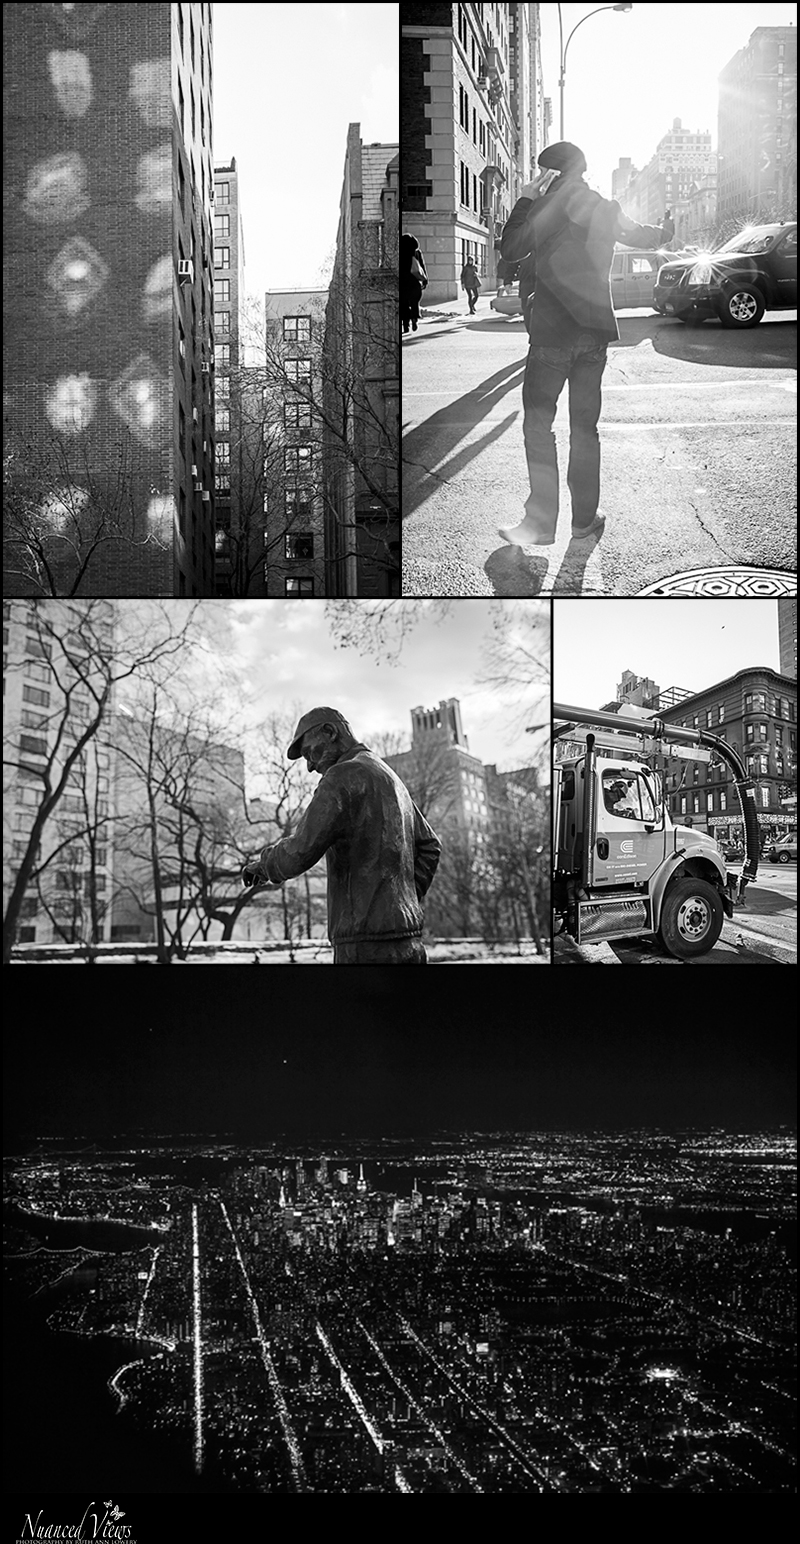 Blog-Collage-1387315175362.jpg